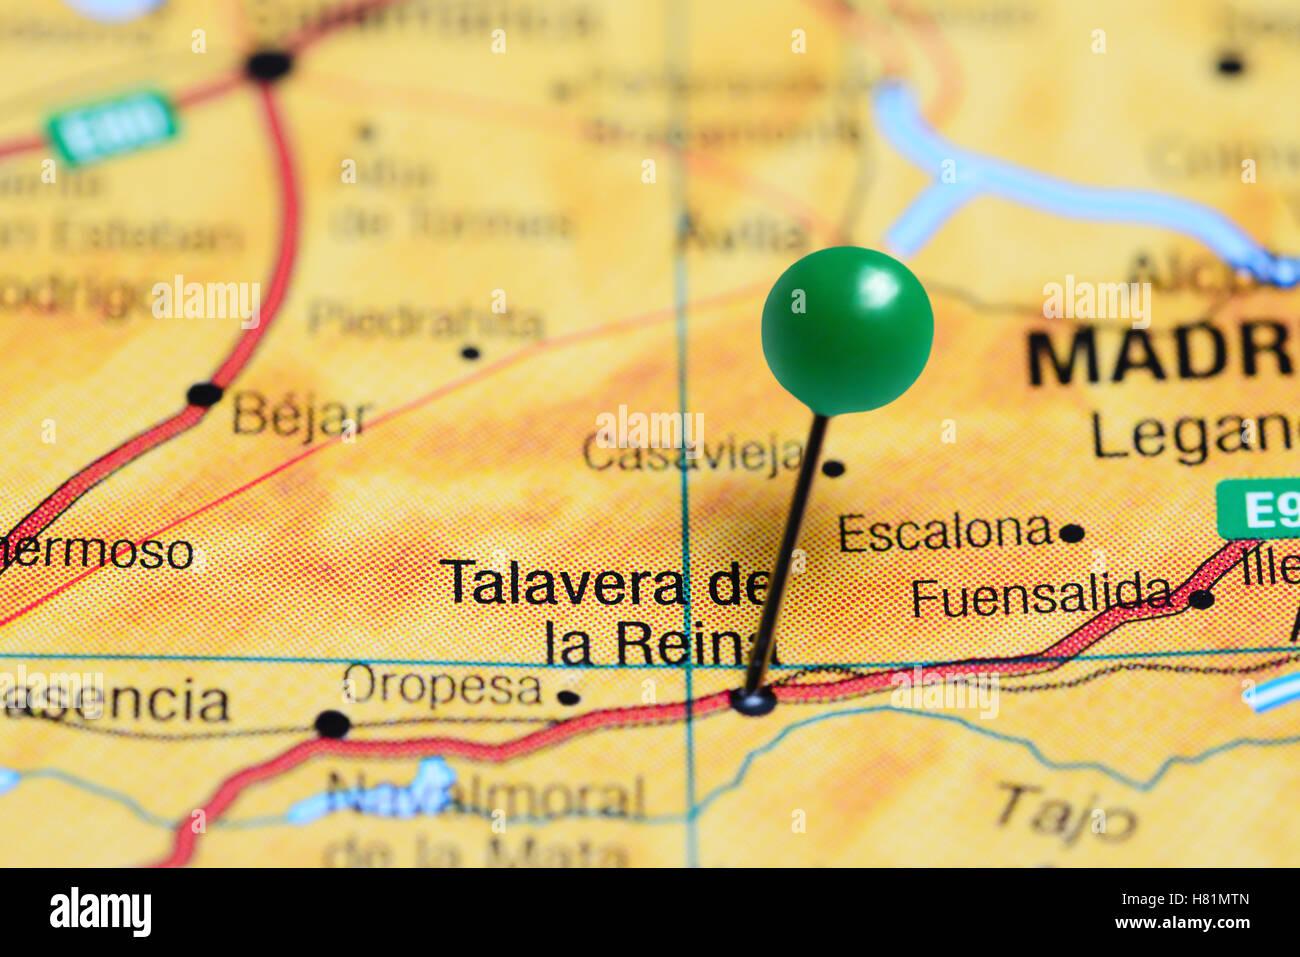 Mapa Talavera Dela Reina.Talavera De La Reina Anclado En Un Mapa De Espana Fotografia De Stock Alamy